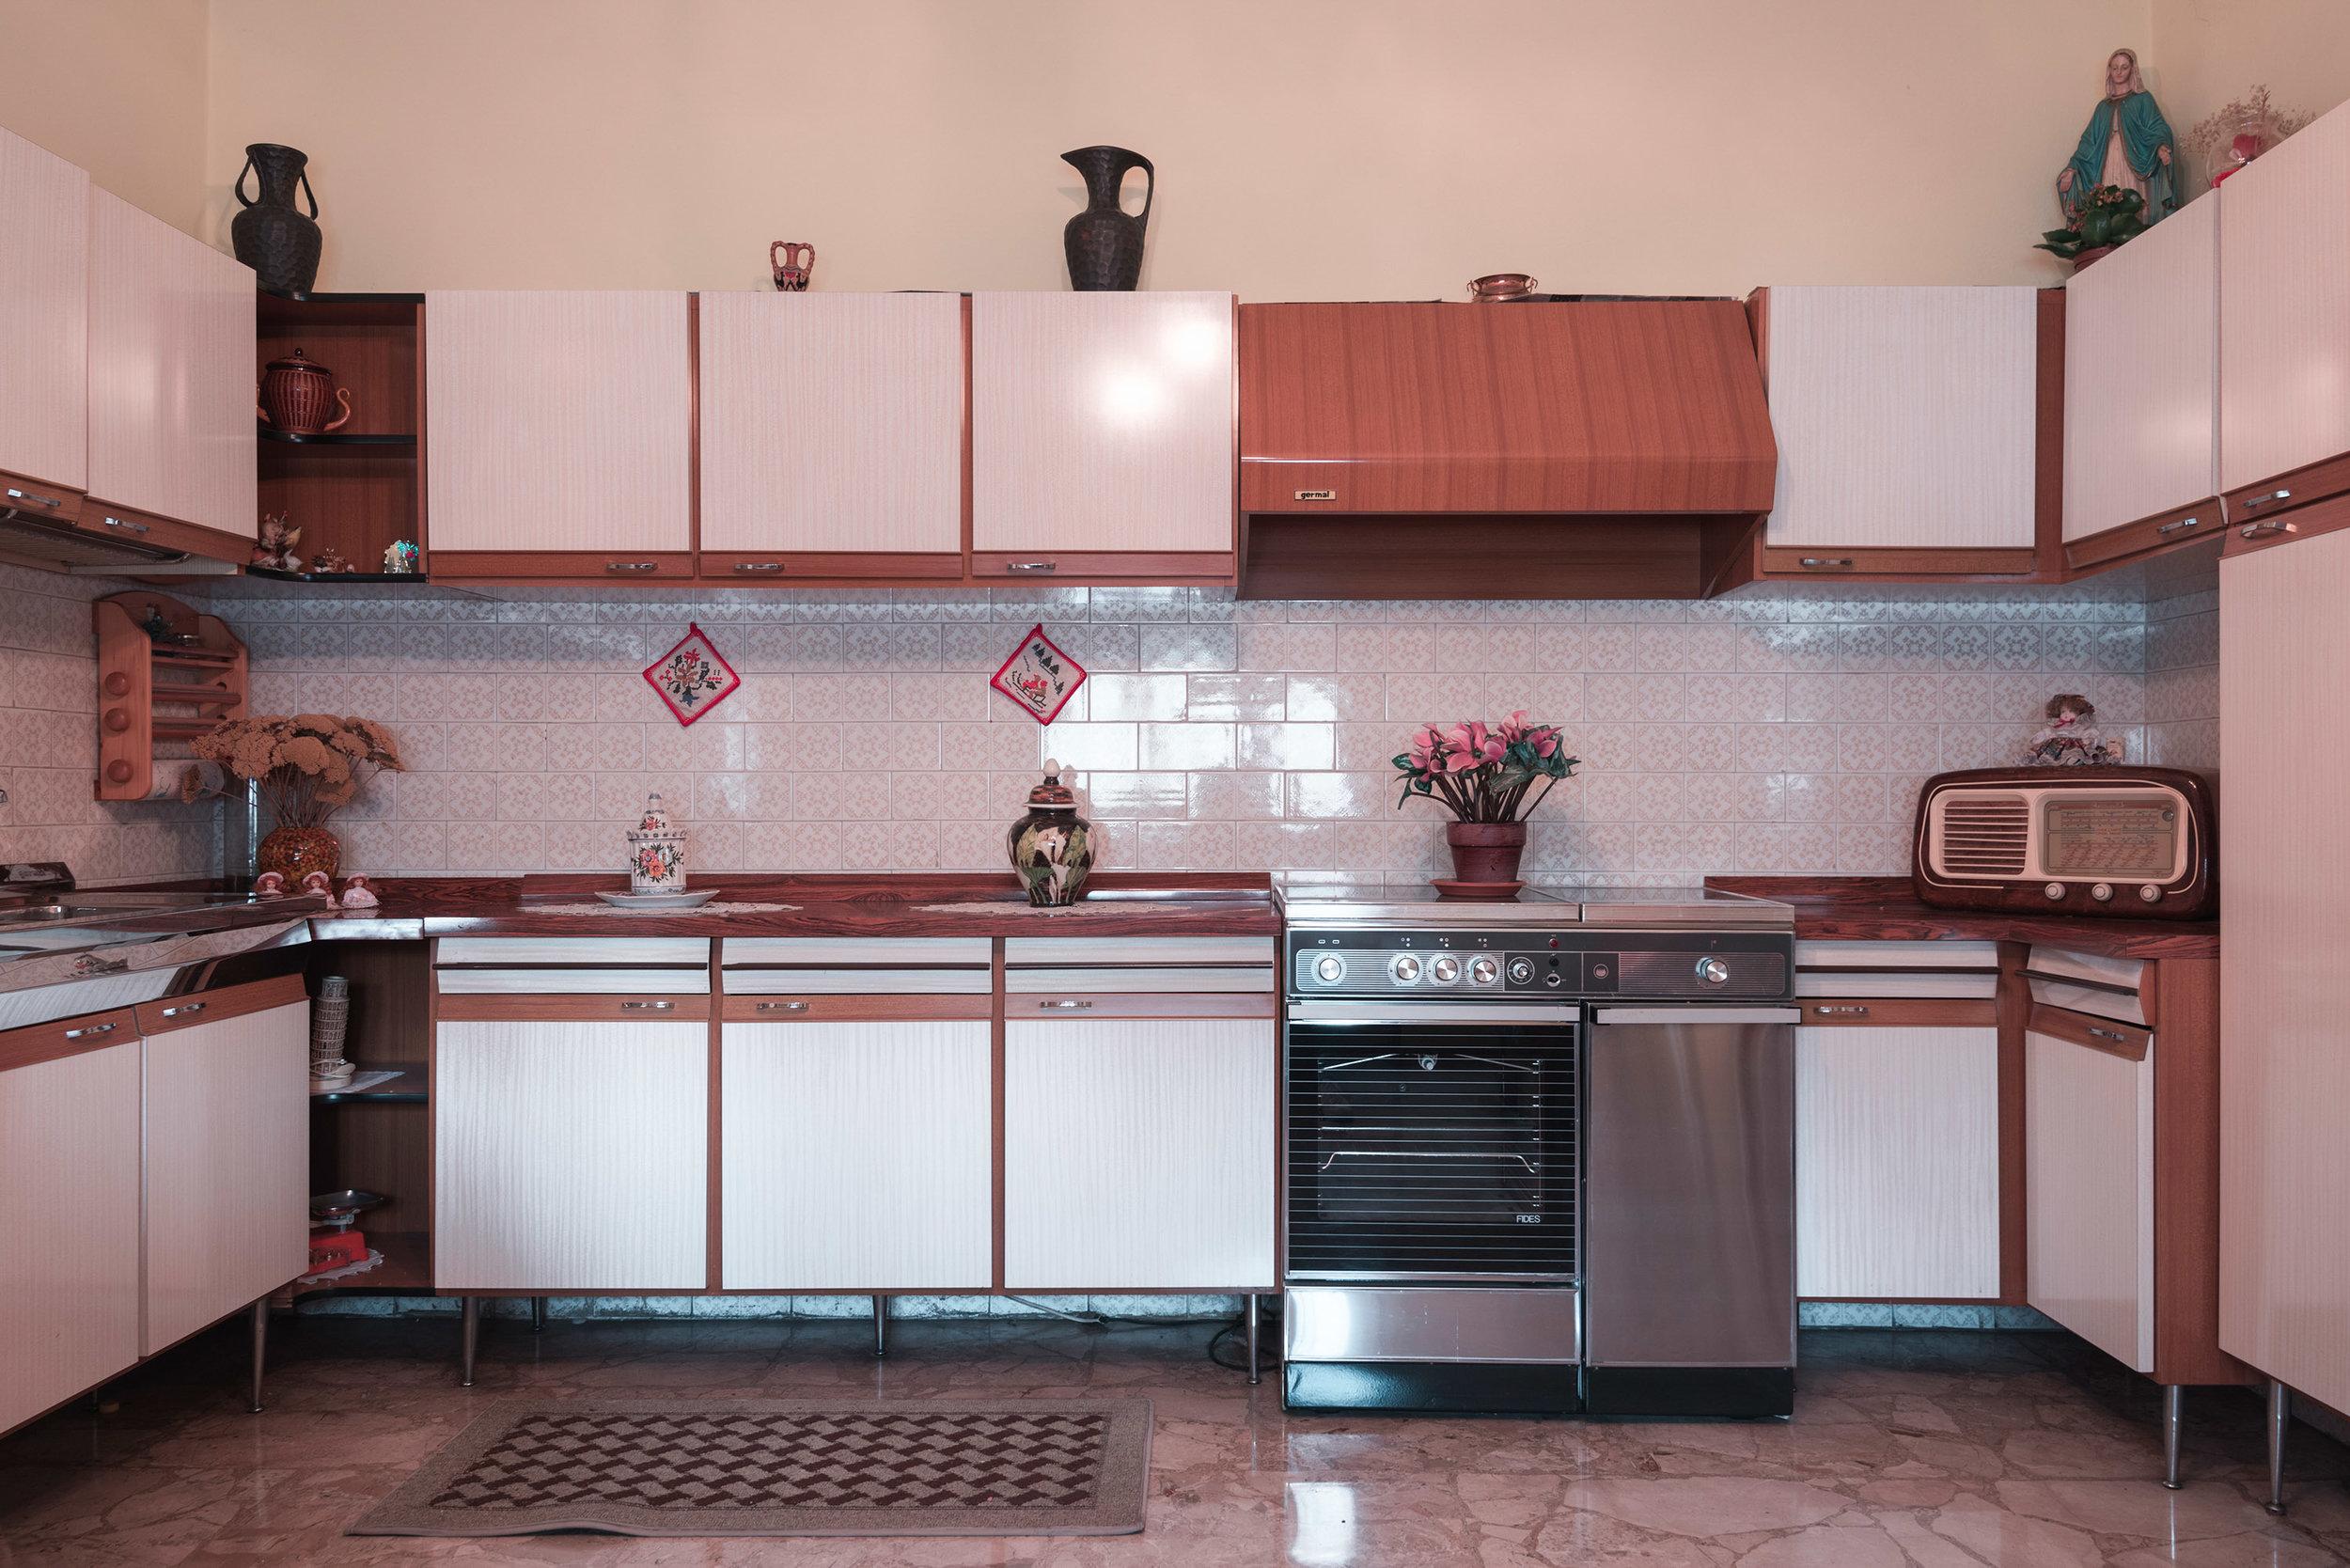 20180407-Cucina alta 3000px.jpg